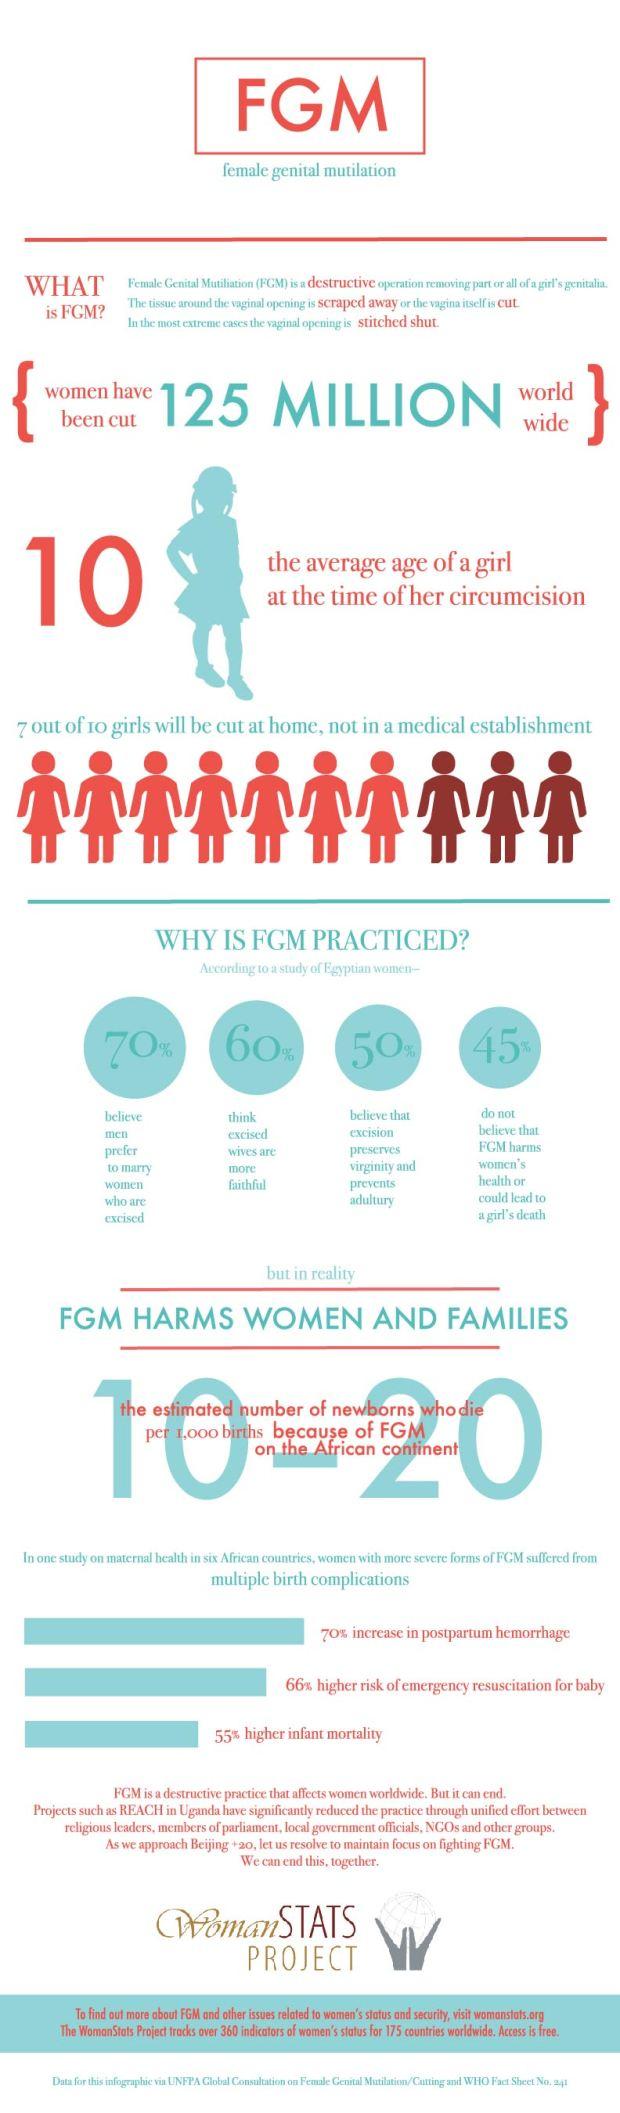 FGM Infographic 2014